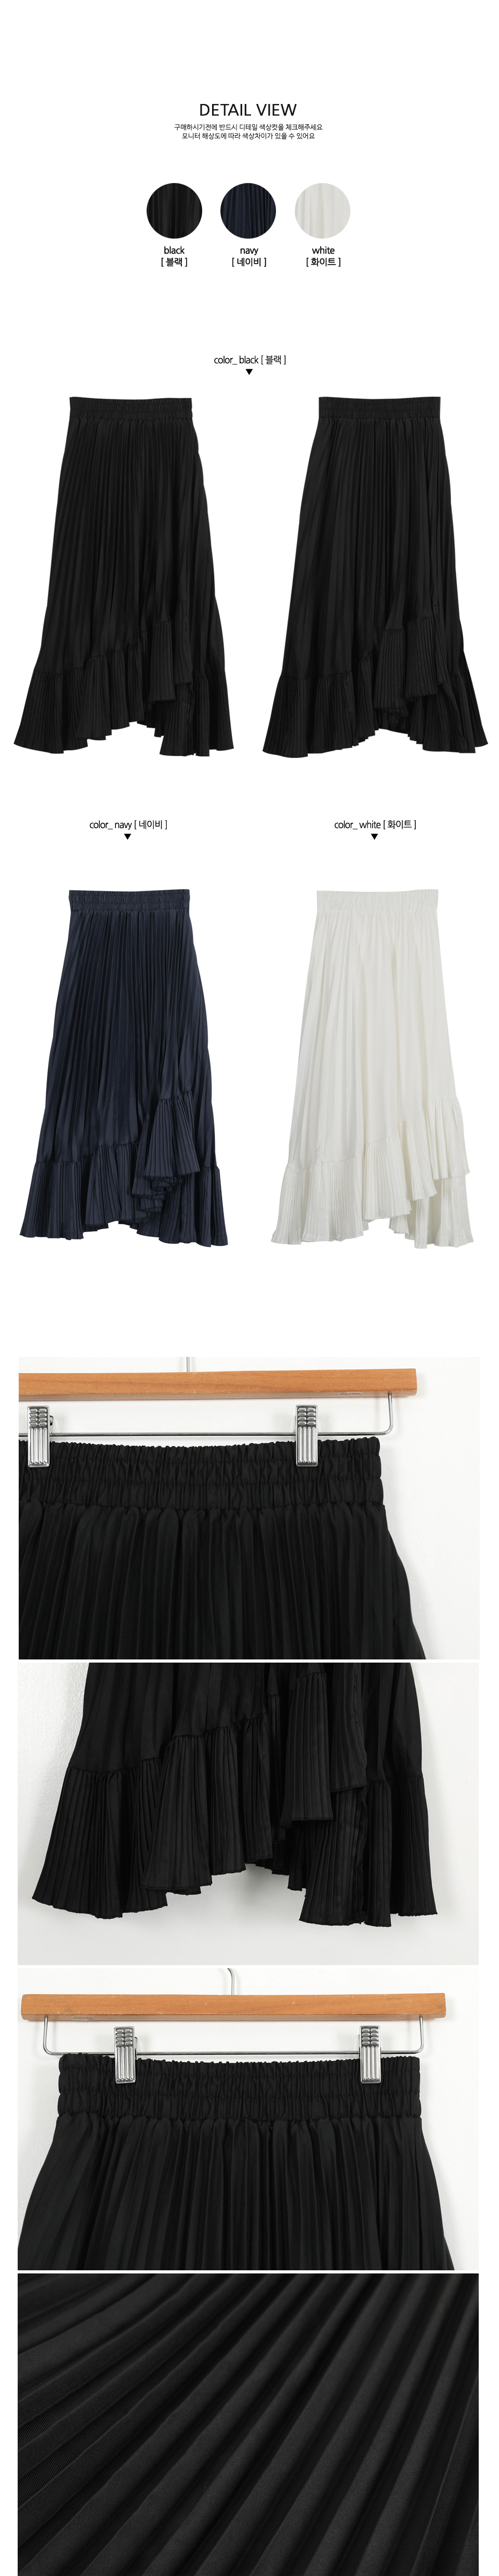 Berry Wrinkle UnBalled Skirt